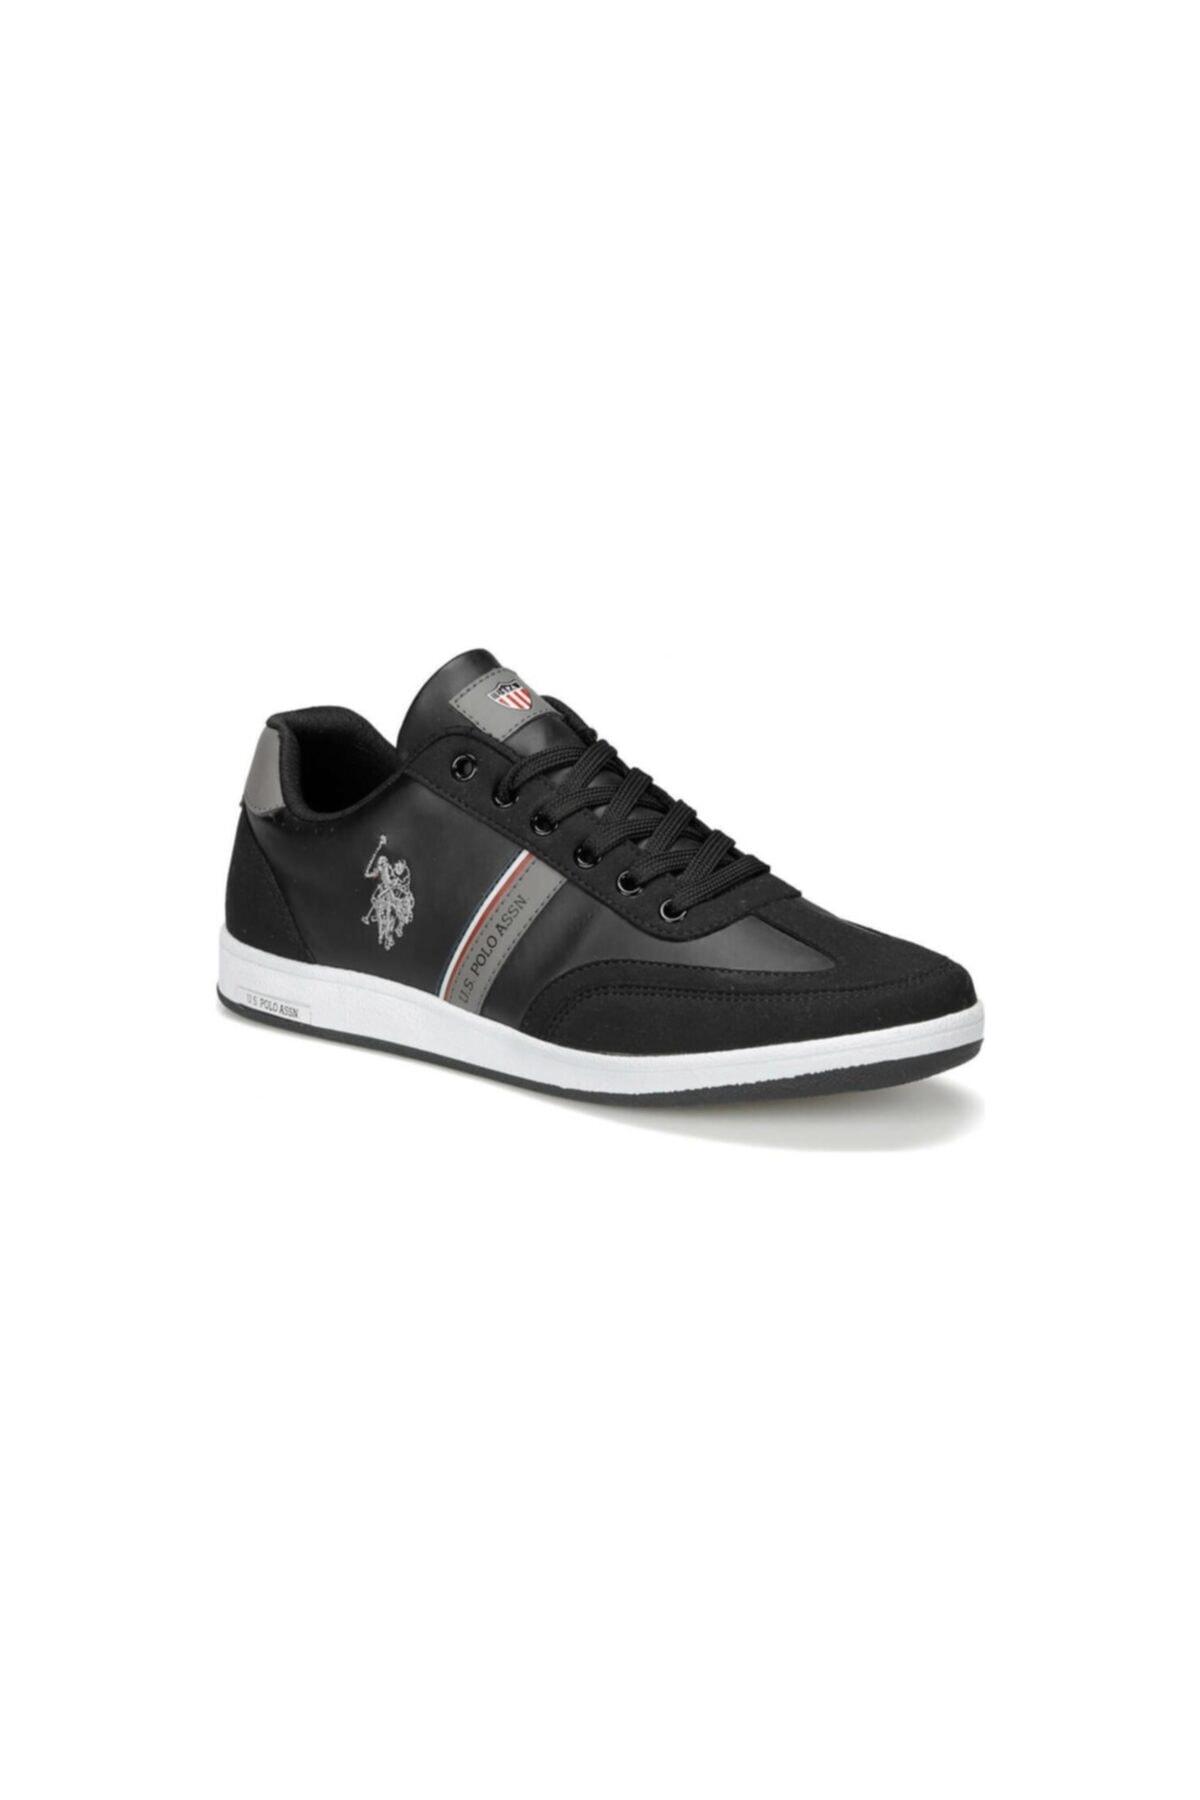 U.S. Polo Assn. KARES WT 9PR Siyah Erkek Sneaker Ayakkabı 100417978 1